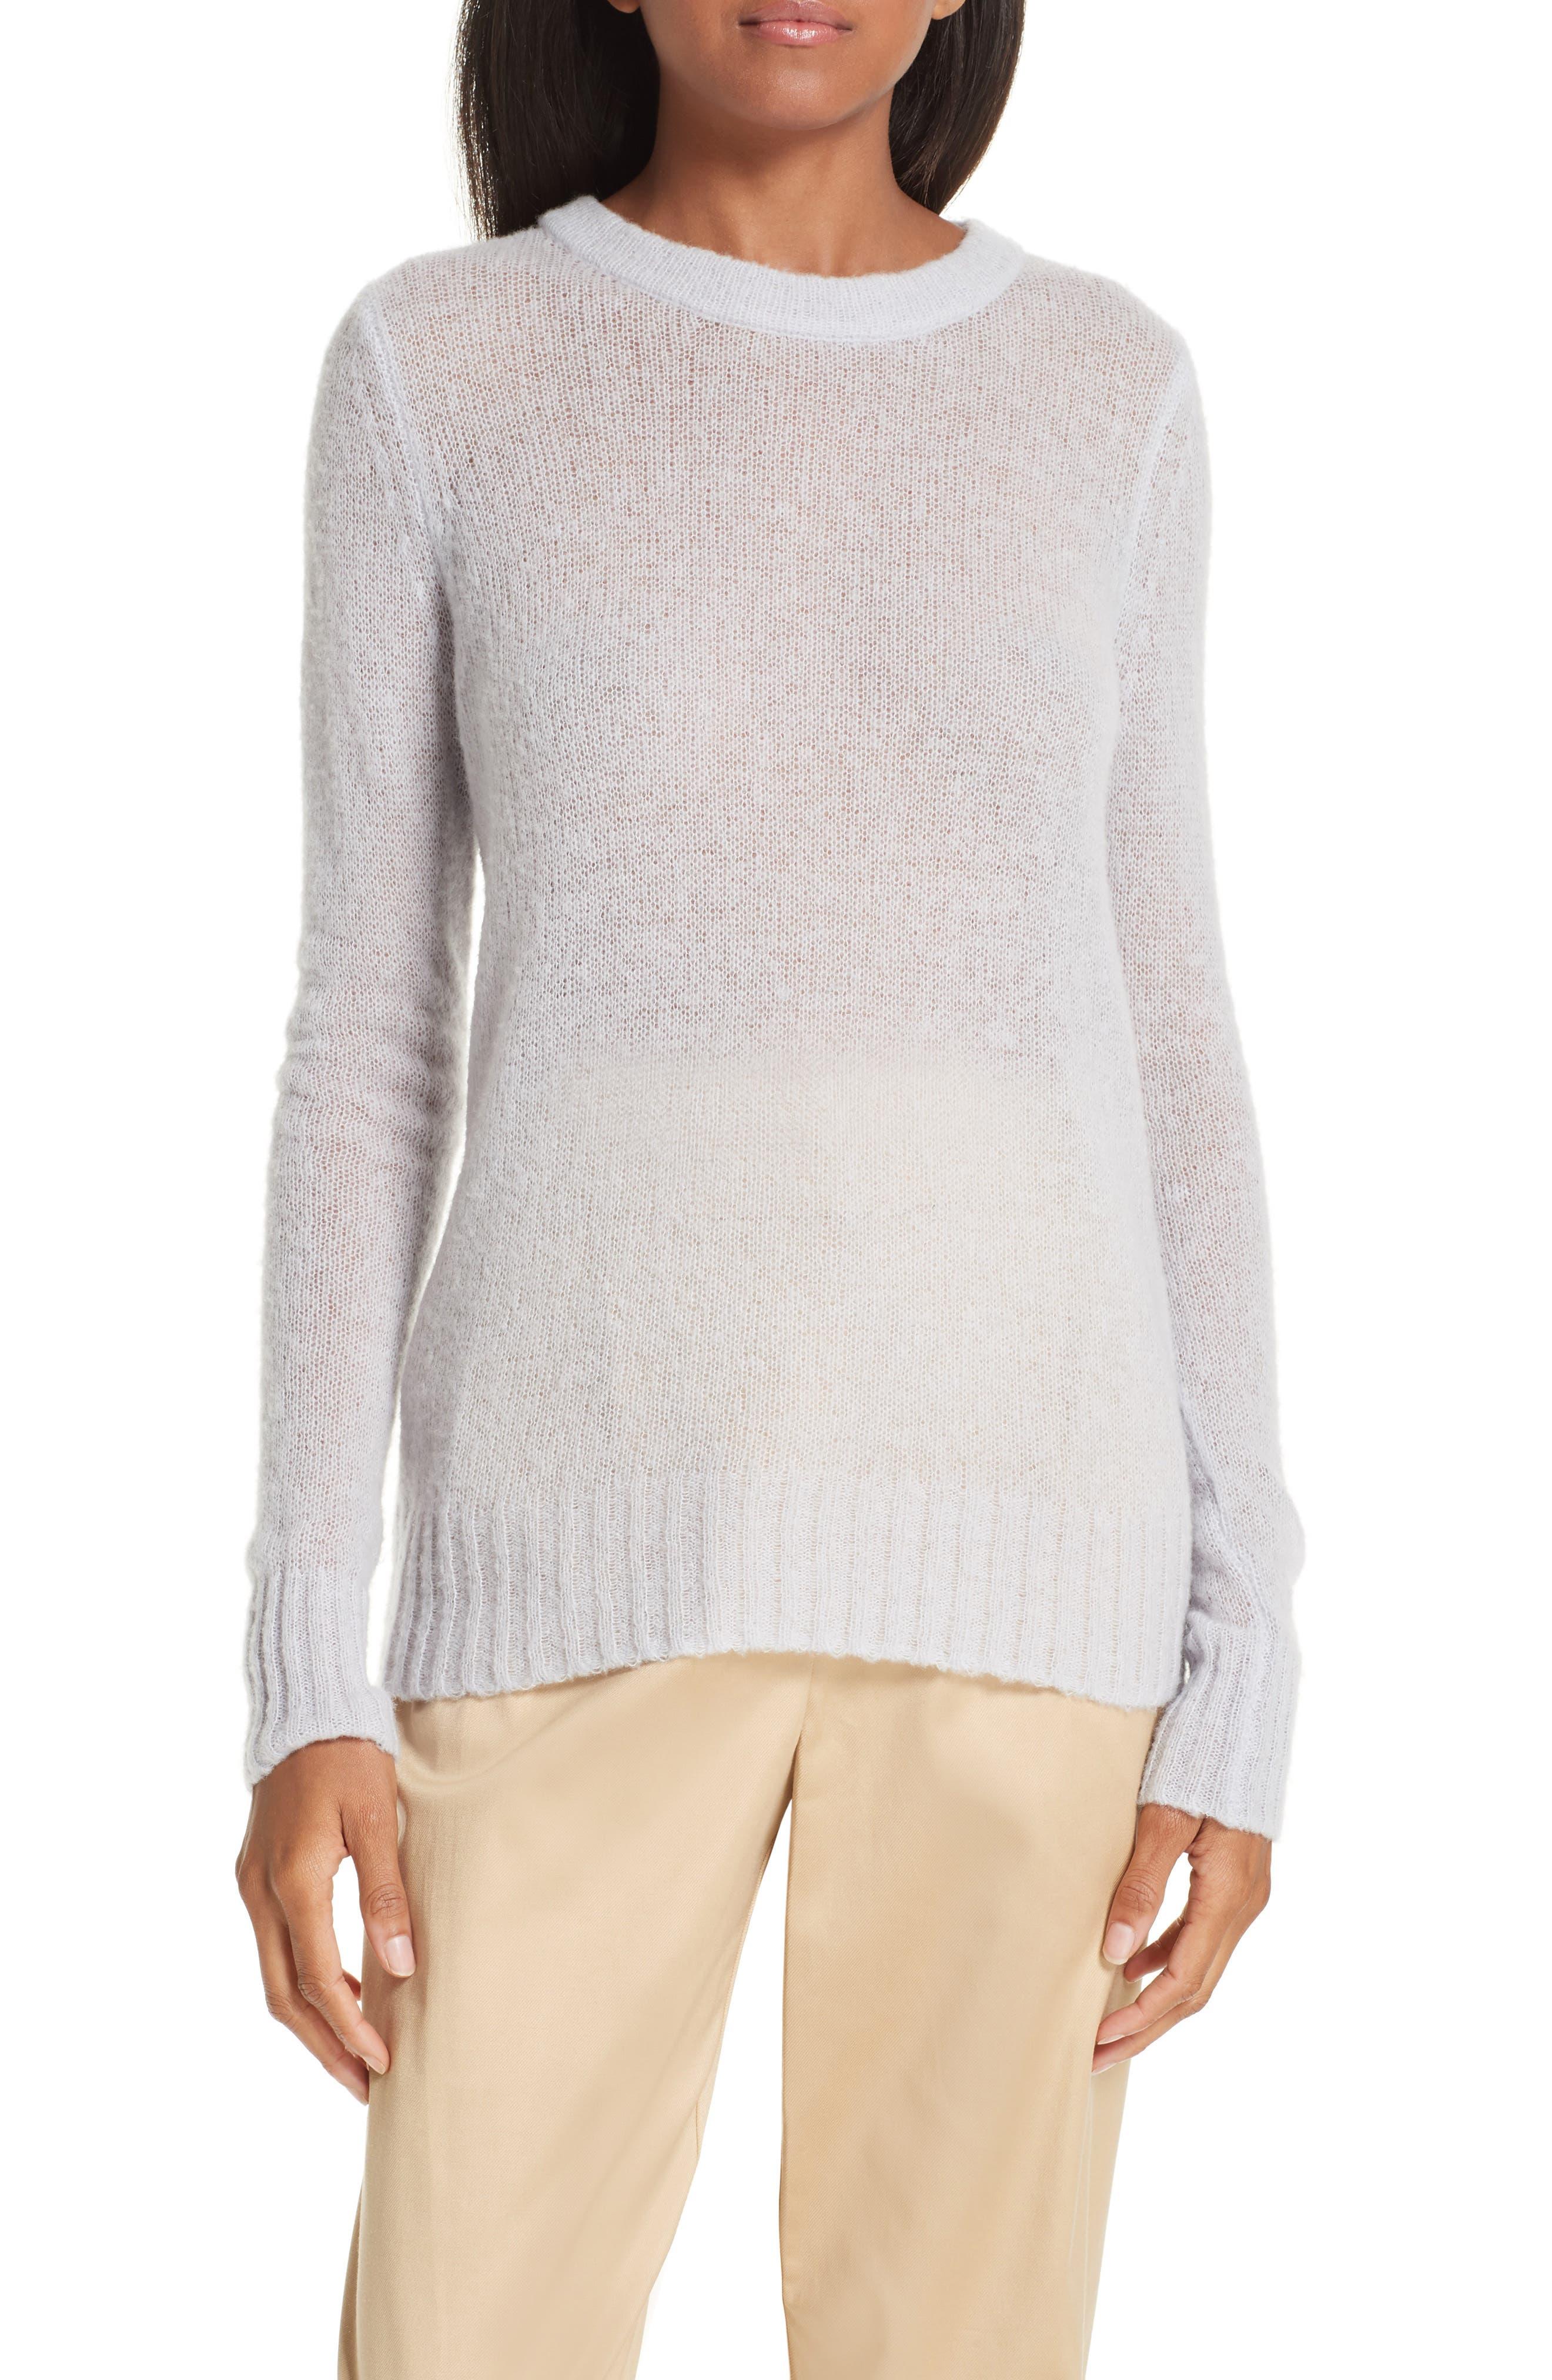 GREY JASON WU Wool Blend Sweater in Wisteria